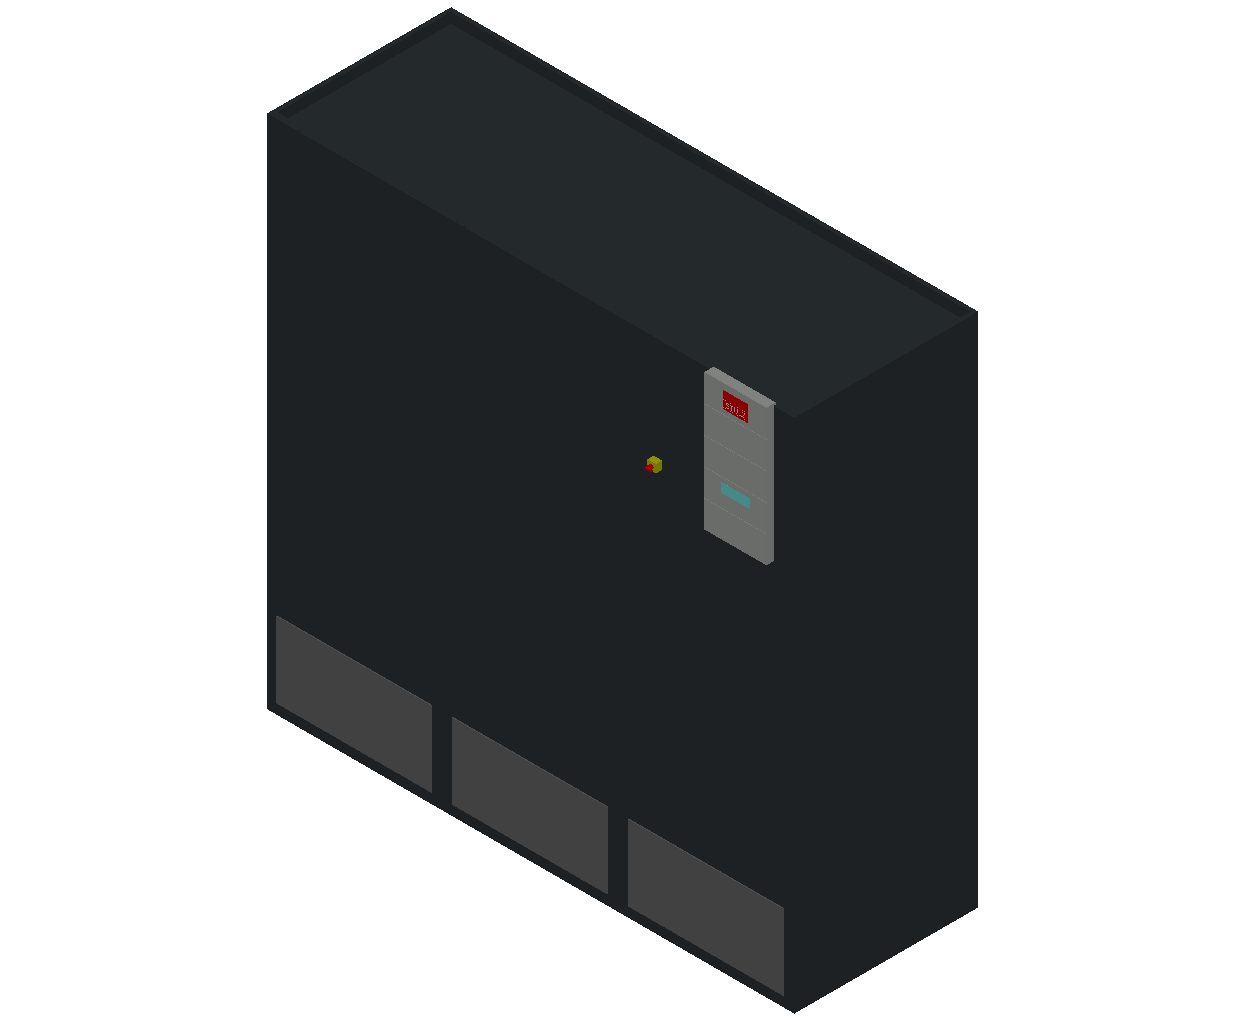 HC_Air Conditioner_Indoor Unit_MEPcontent_STULZ_CyberAir 3PRO_ASR_Dual Circuit A_ASR_822_A_INT-EN.dwg